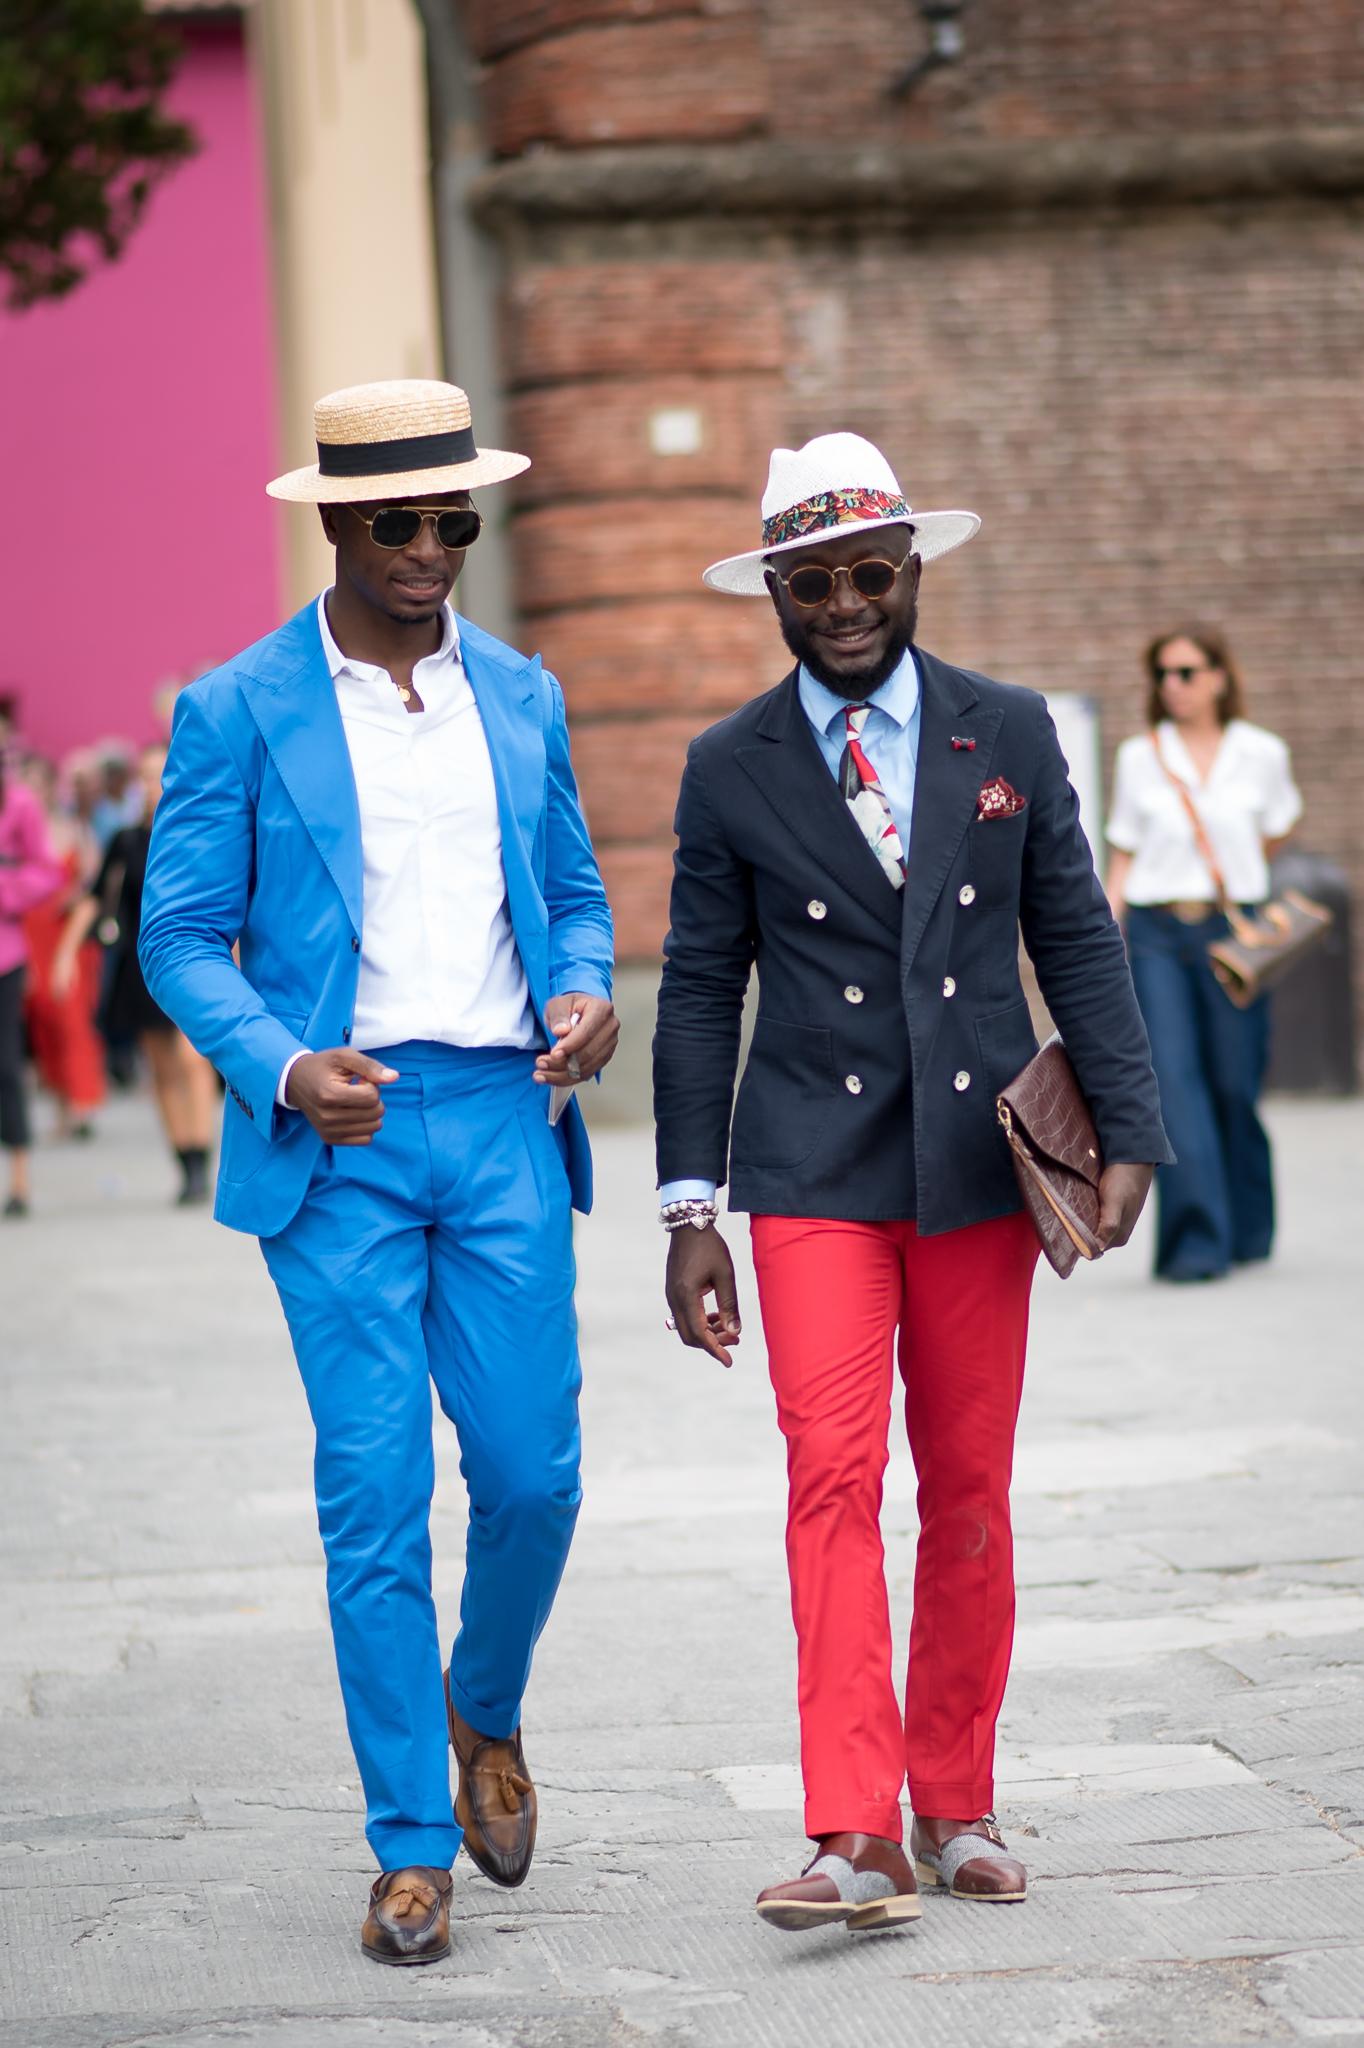 Manuel Godinho & Lourens Gebhardt Street Style Pitti Uomo 92 Florence June 2017 Photography Annika Lagerqvist www.annikasomething.com